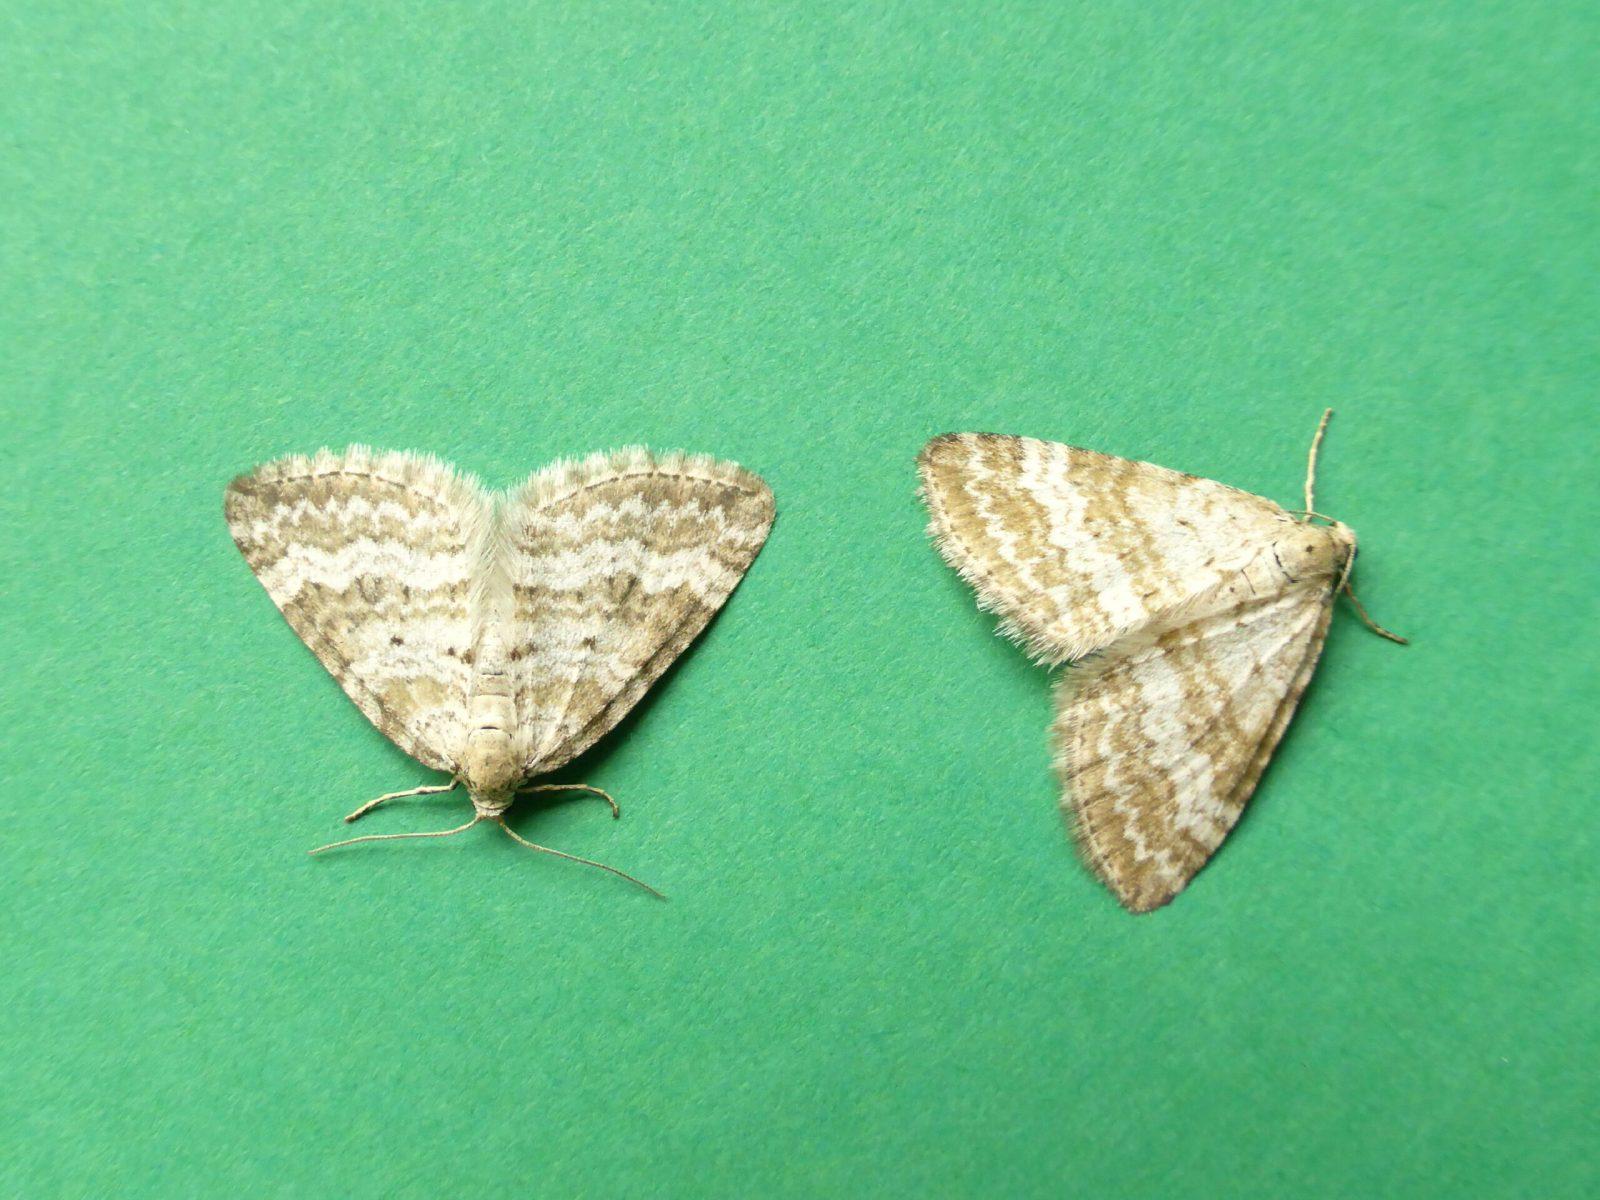 Paerizoma albulata - Grass Rivulet - Kirk Smeaton